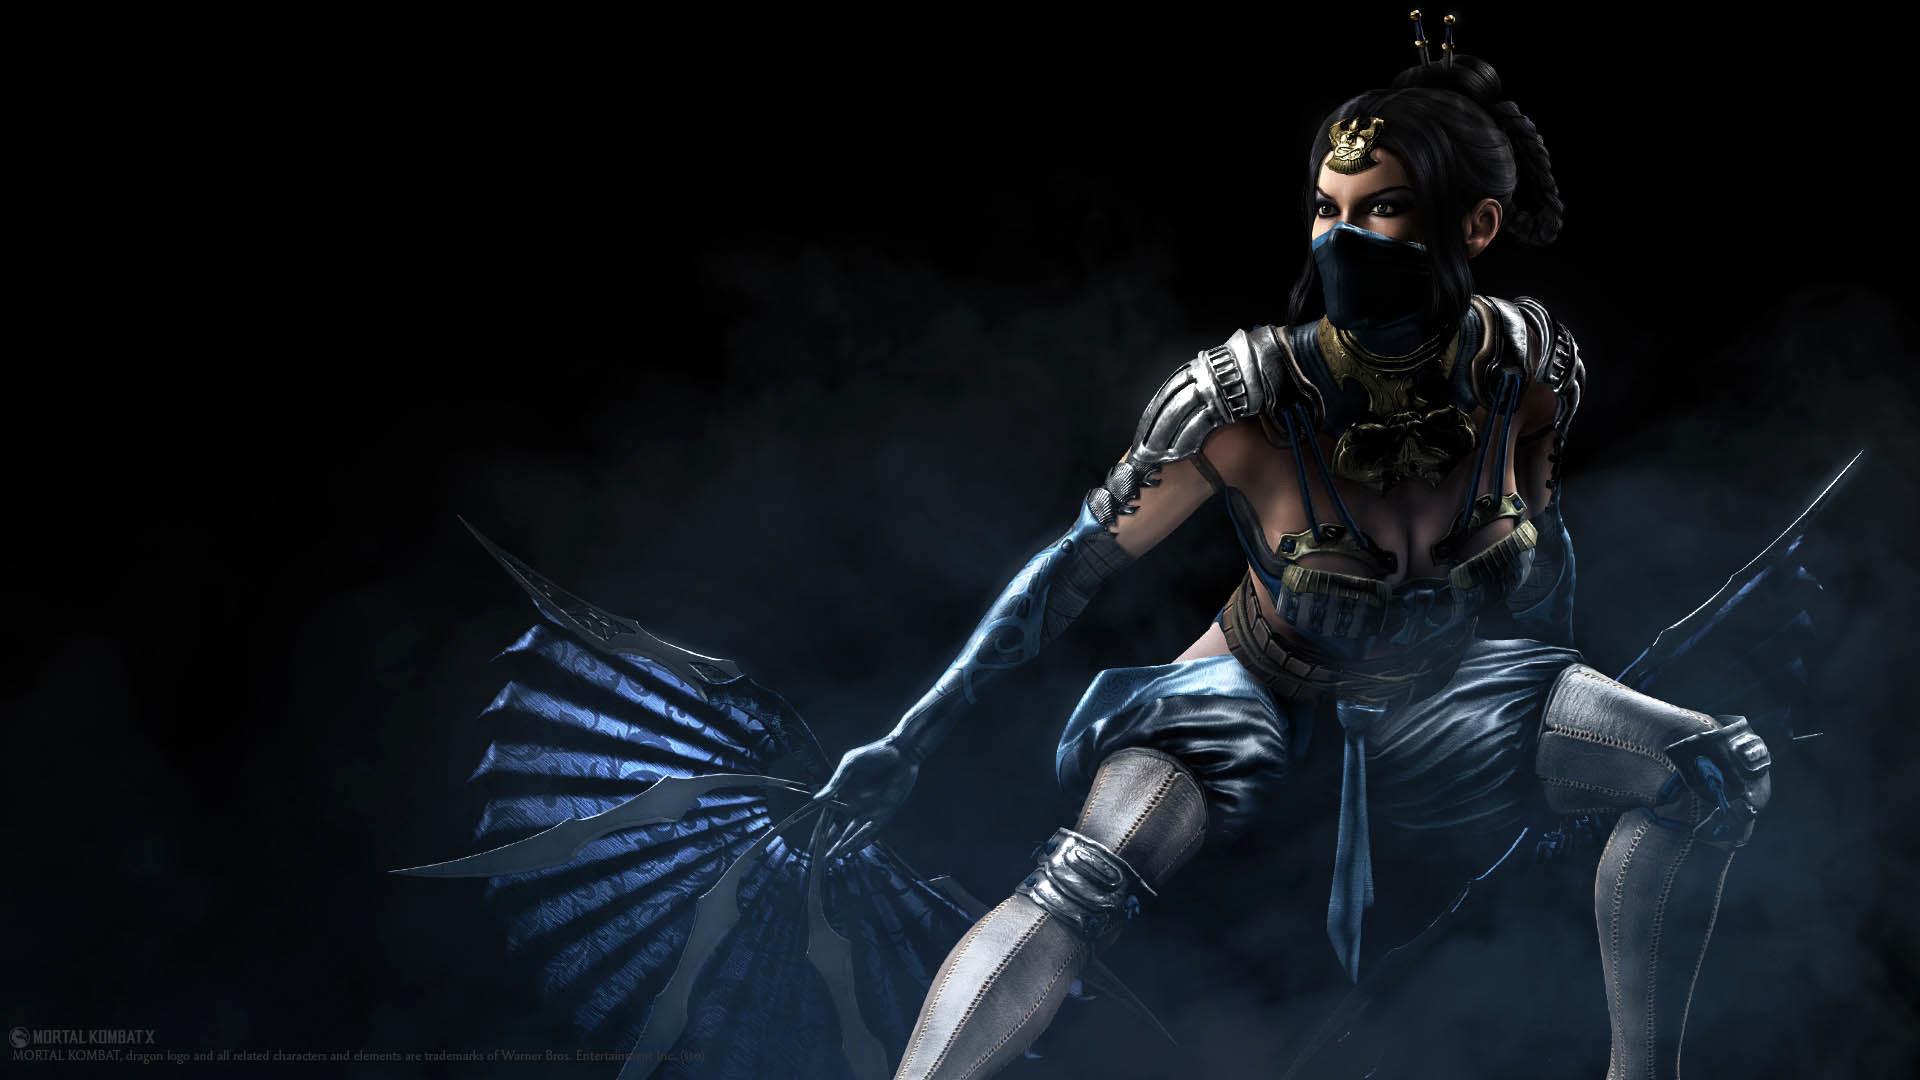 Mortal Kombat X Kitana Wallpaper 77 Images